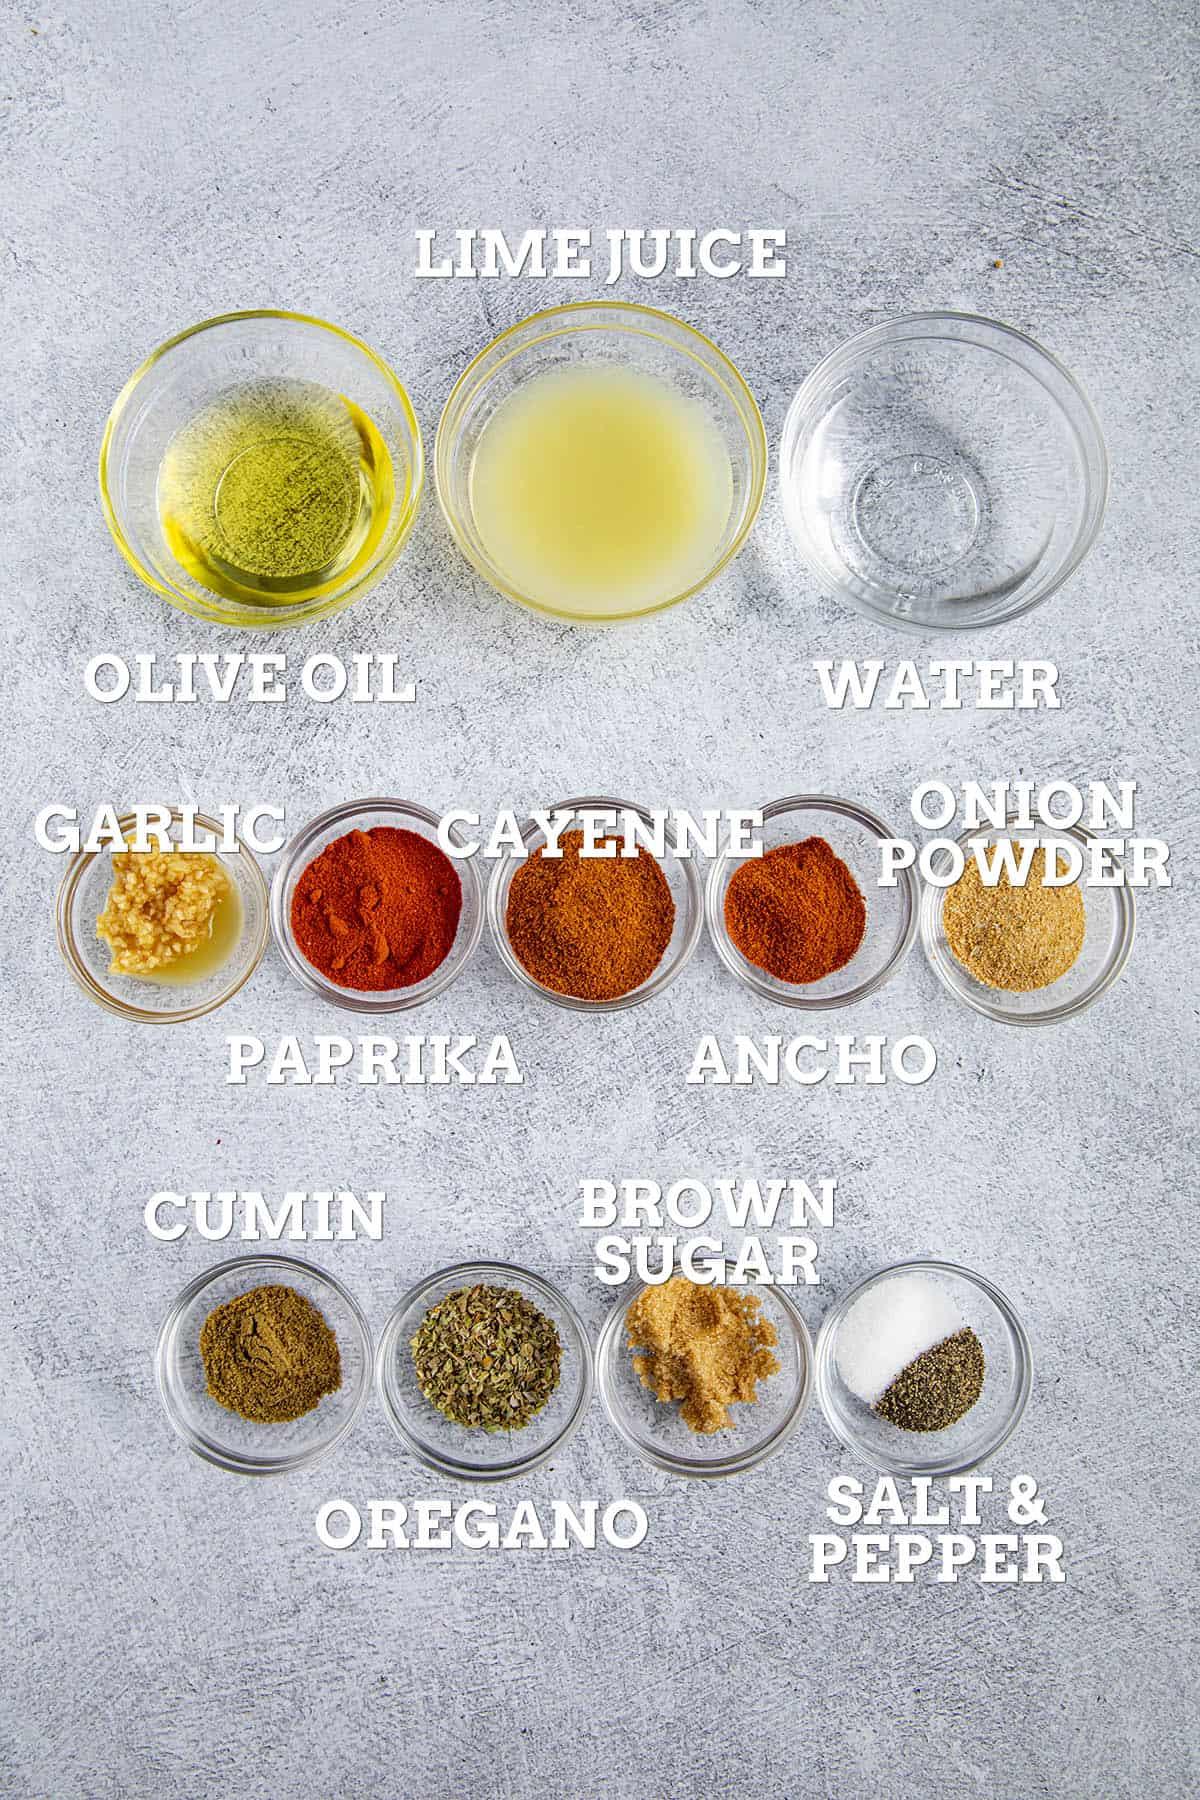 Fajita Marinade ingredients